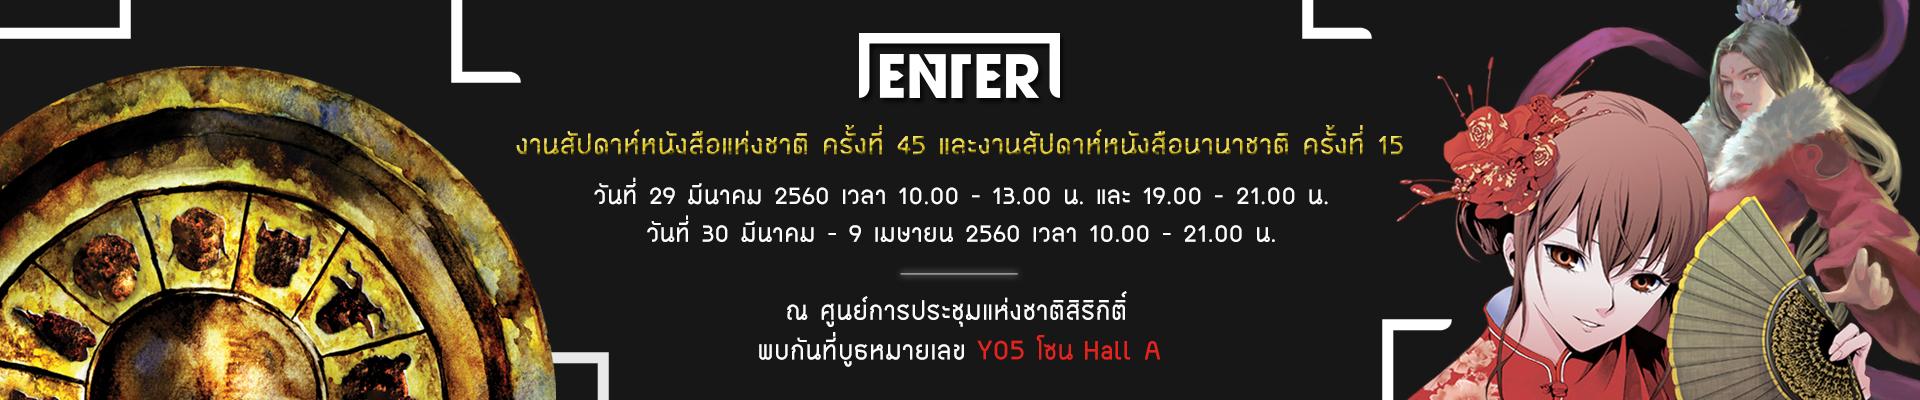 Enter Banner1920x400